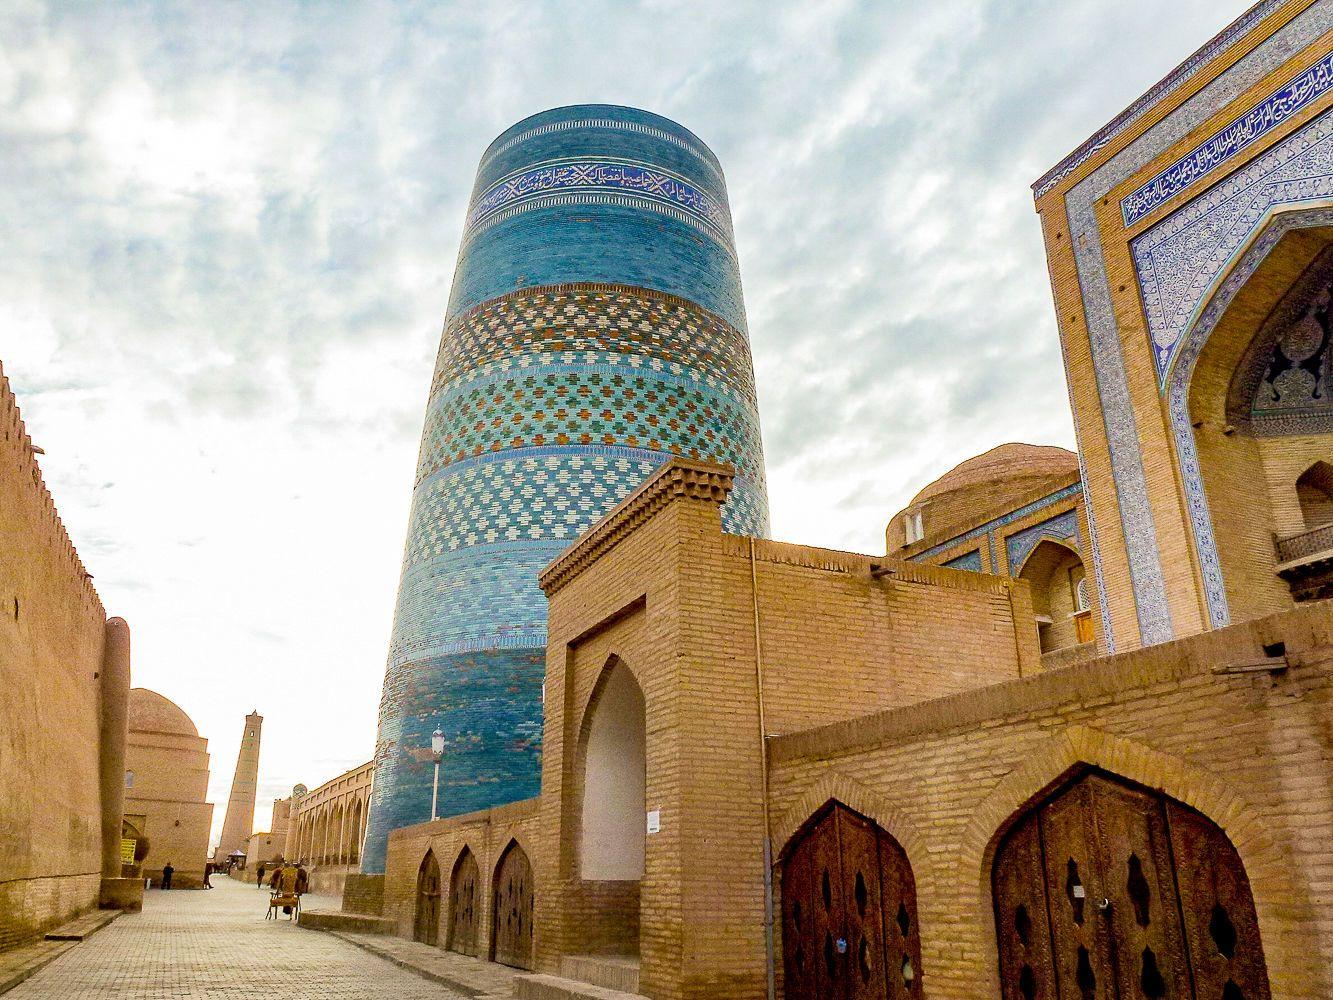 Central Asia Tour - Blue minaret in Khiva, Kalta minor